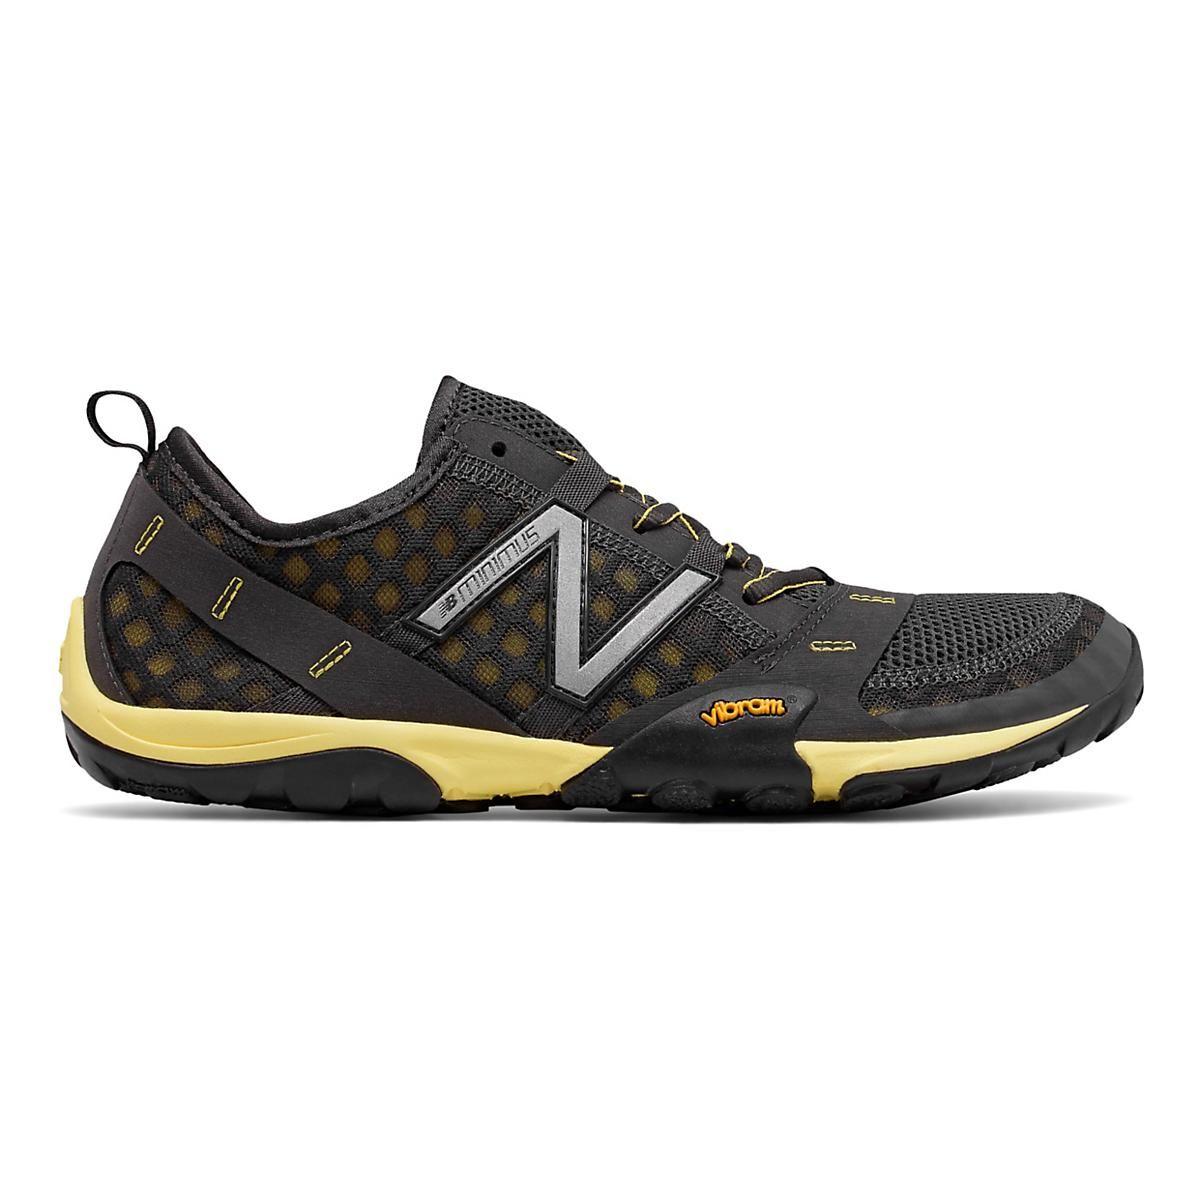 New Balance 10v1 Trail Running Shoe - 7